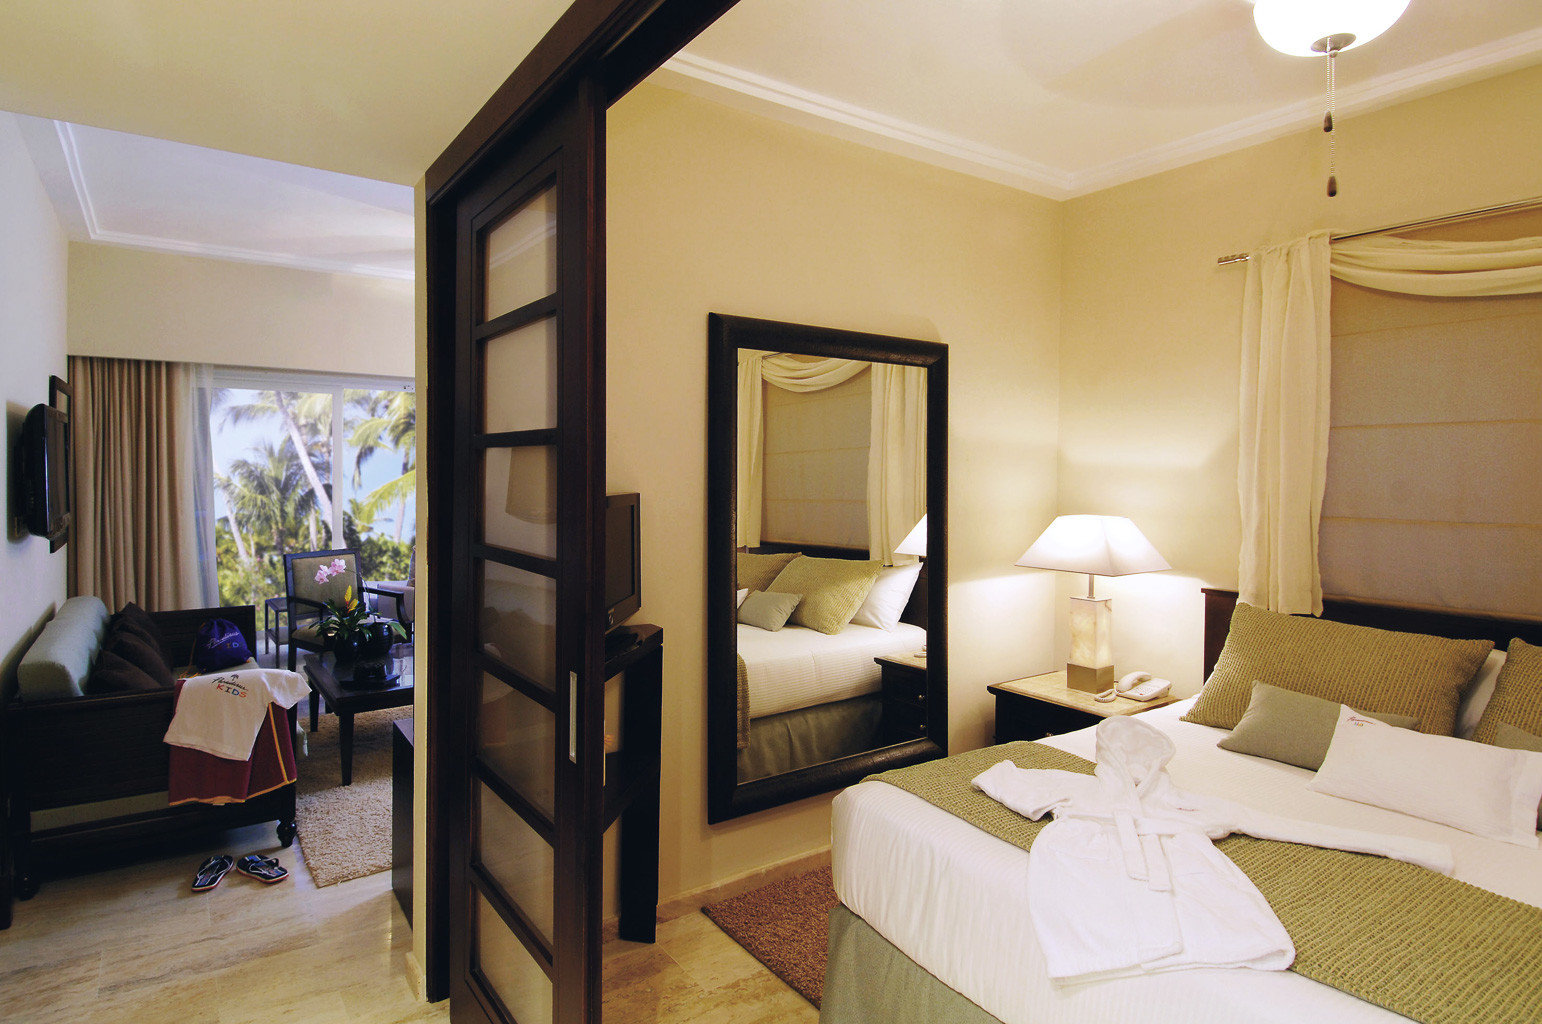 All-inclusive Bedroom Family Lounge Resort Suite property cottage home living room Villa condominium